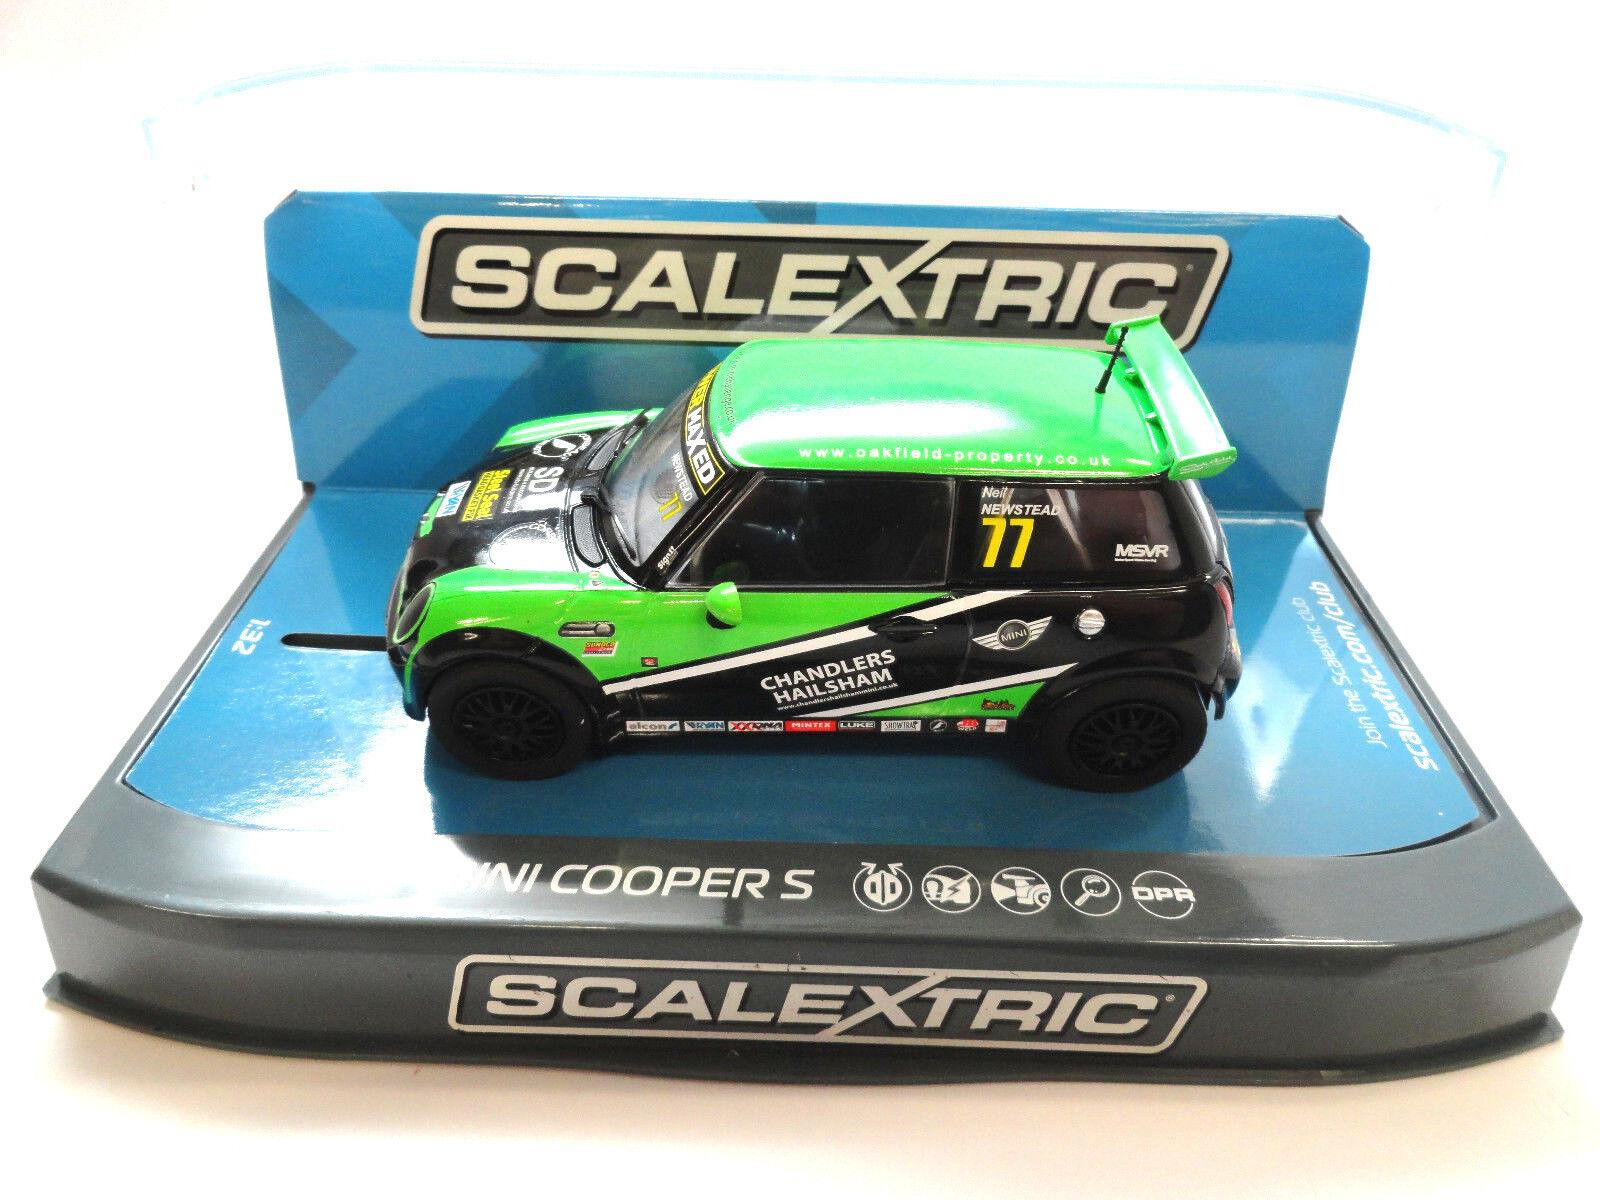 Scalextric  Chandlers Hailsham  BMW Mini Cooper S DPR 1 32 Scale Slot Car C3743